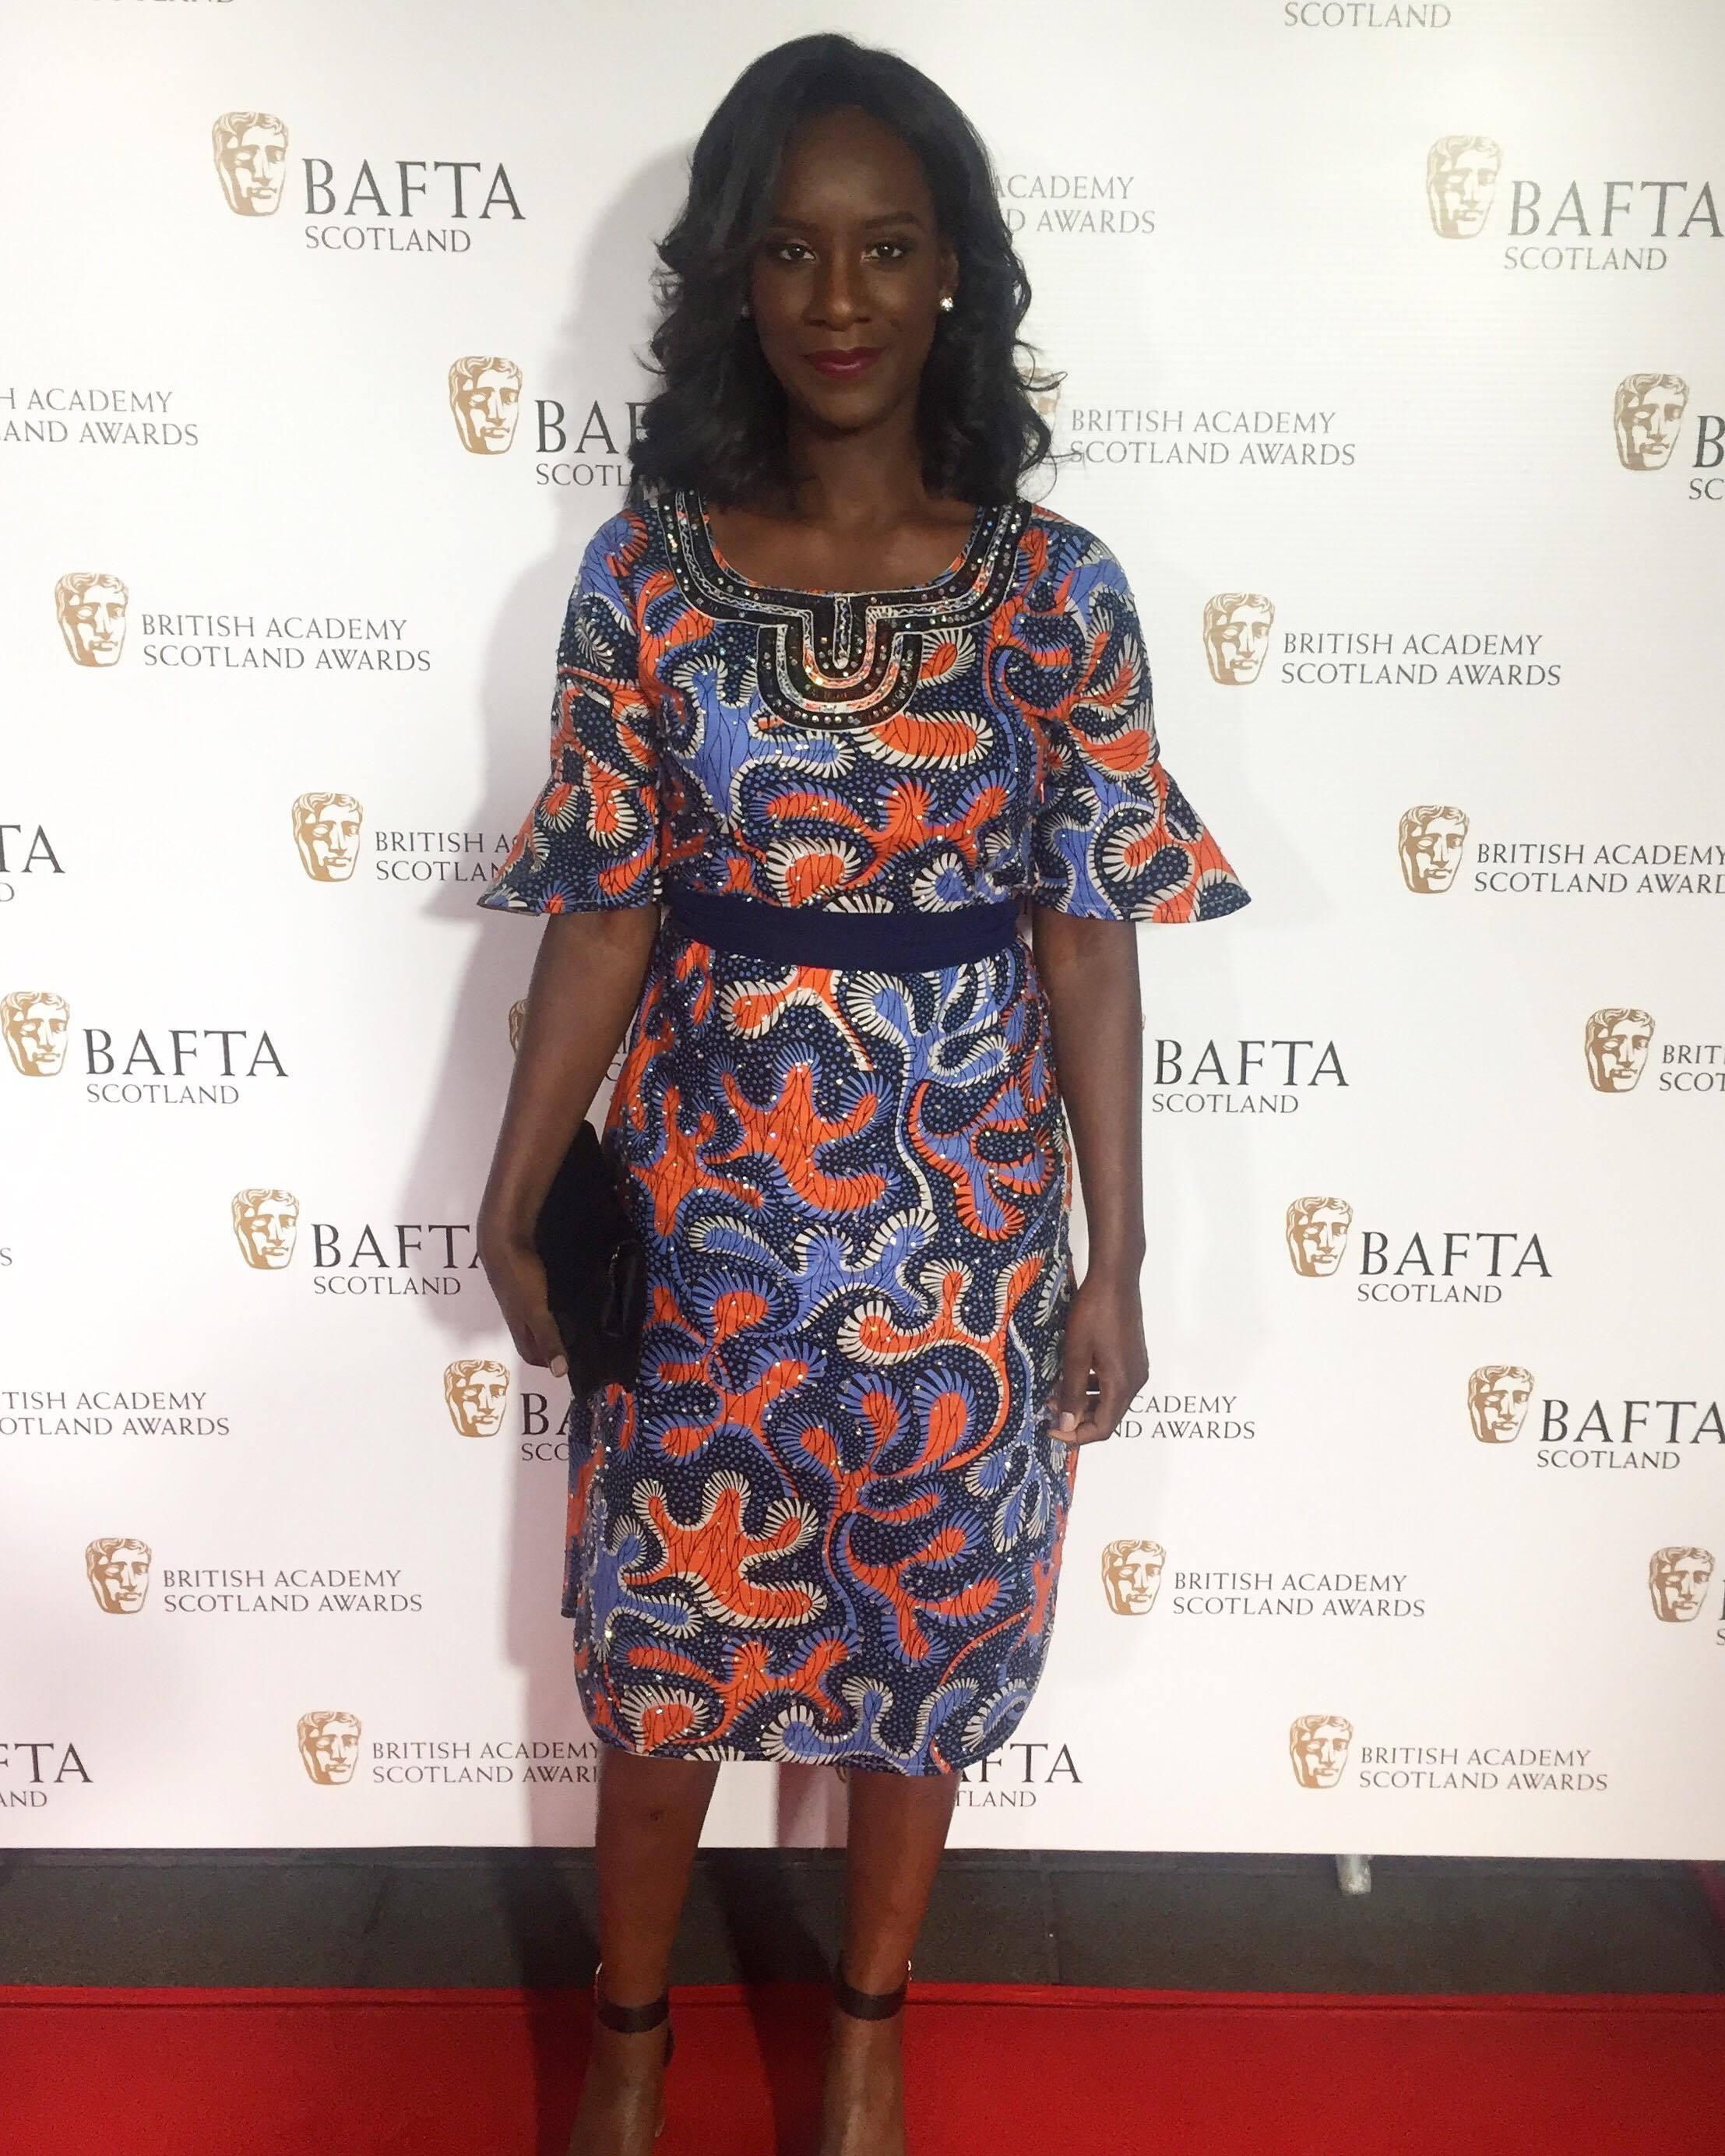 BAFTA Scotland Red Carpet - Moyo Akande.jpg